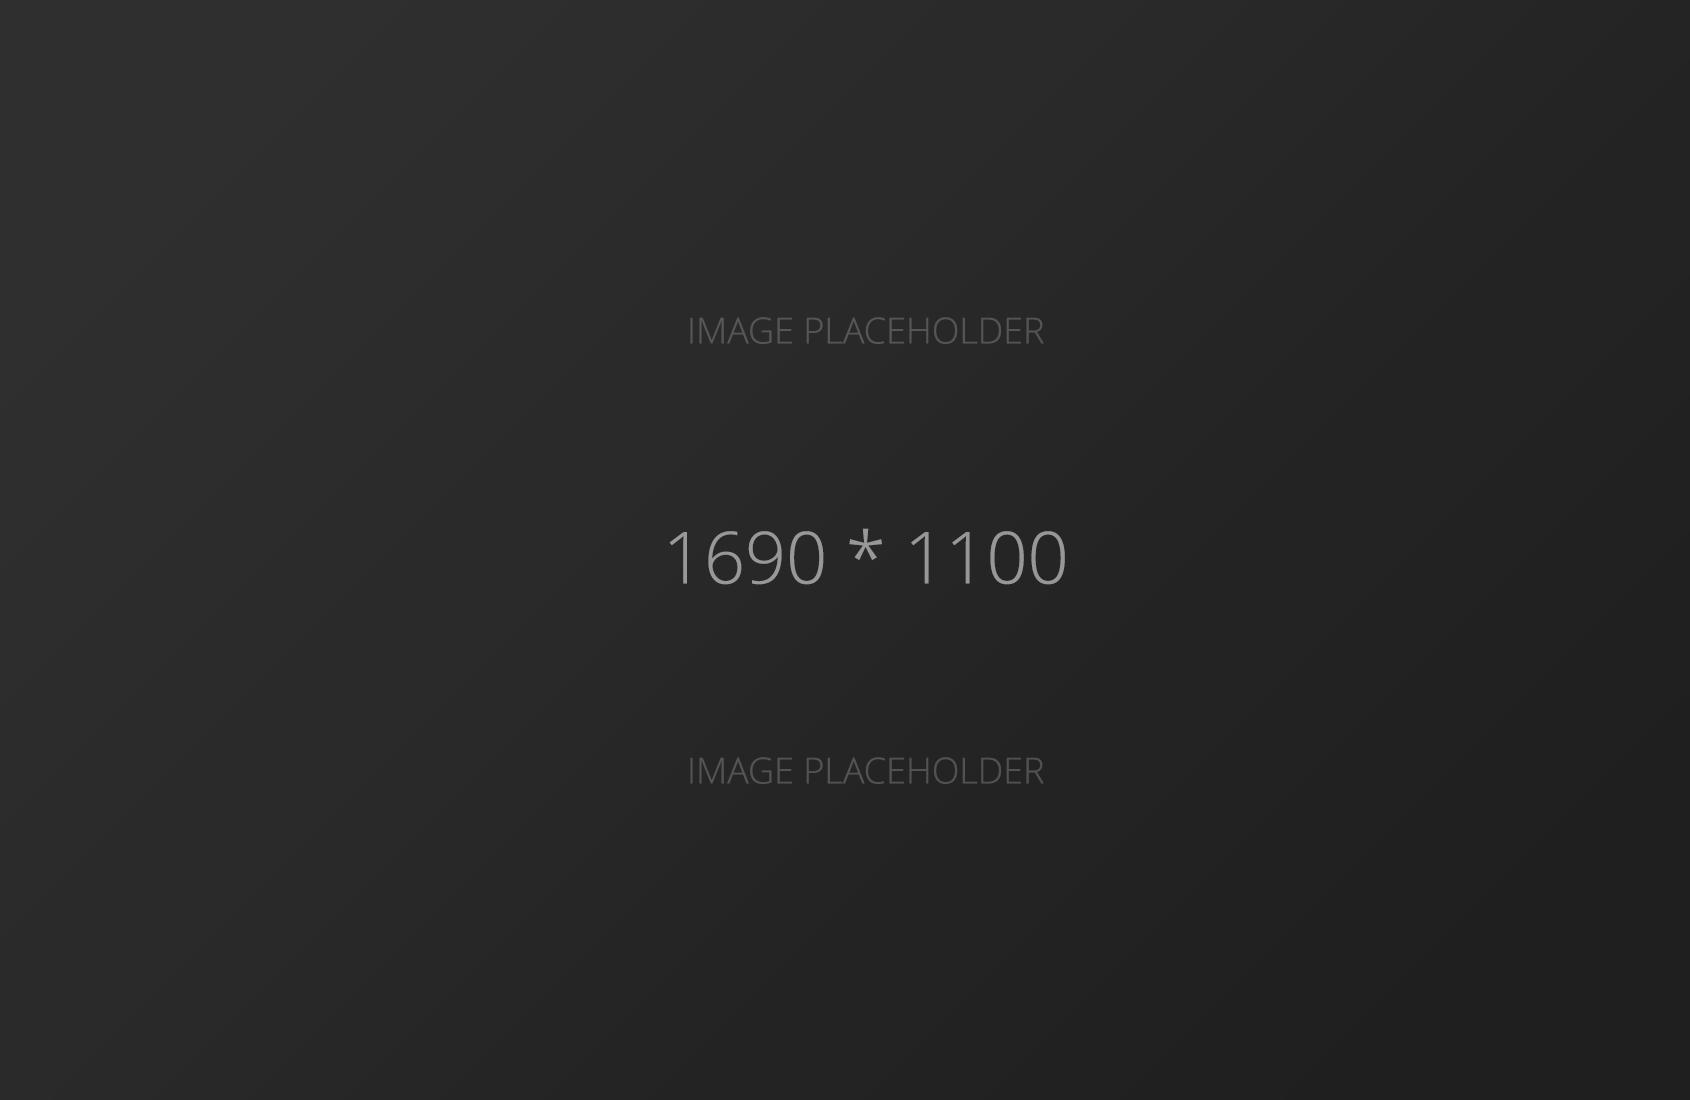 1690x1100